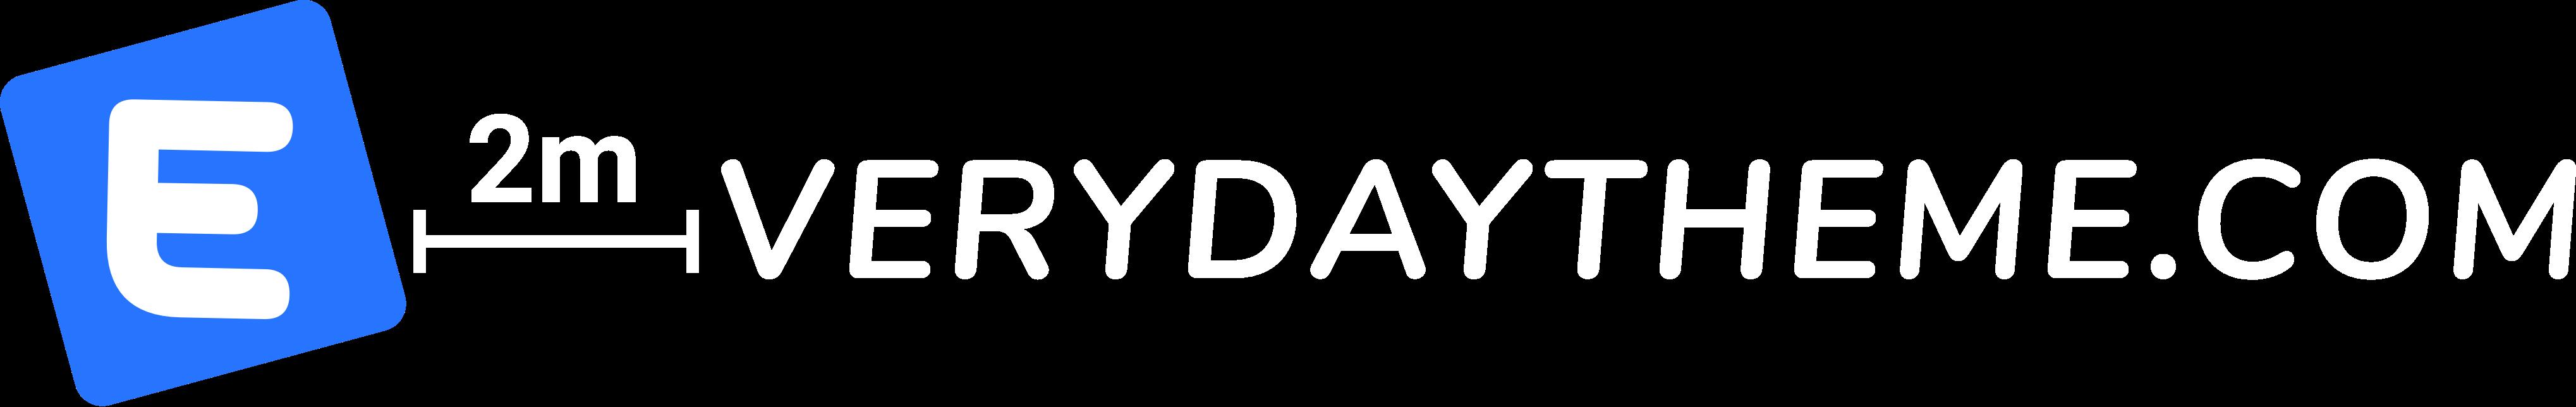 everydaytheme.com